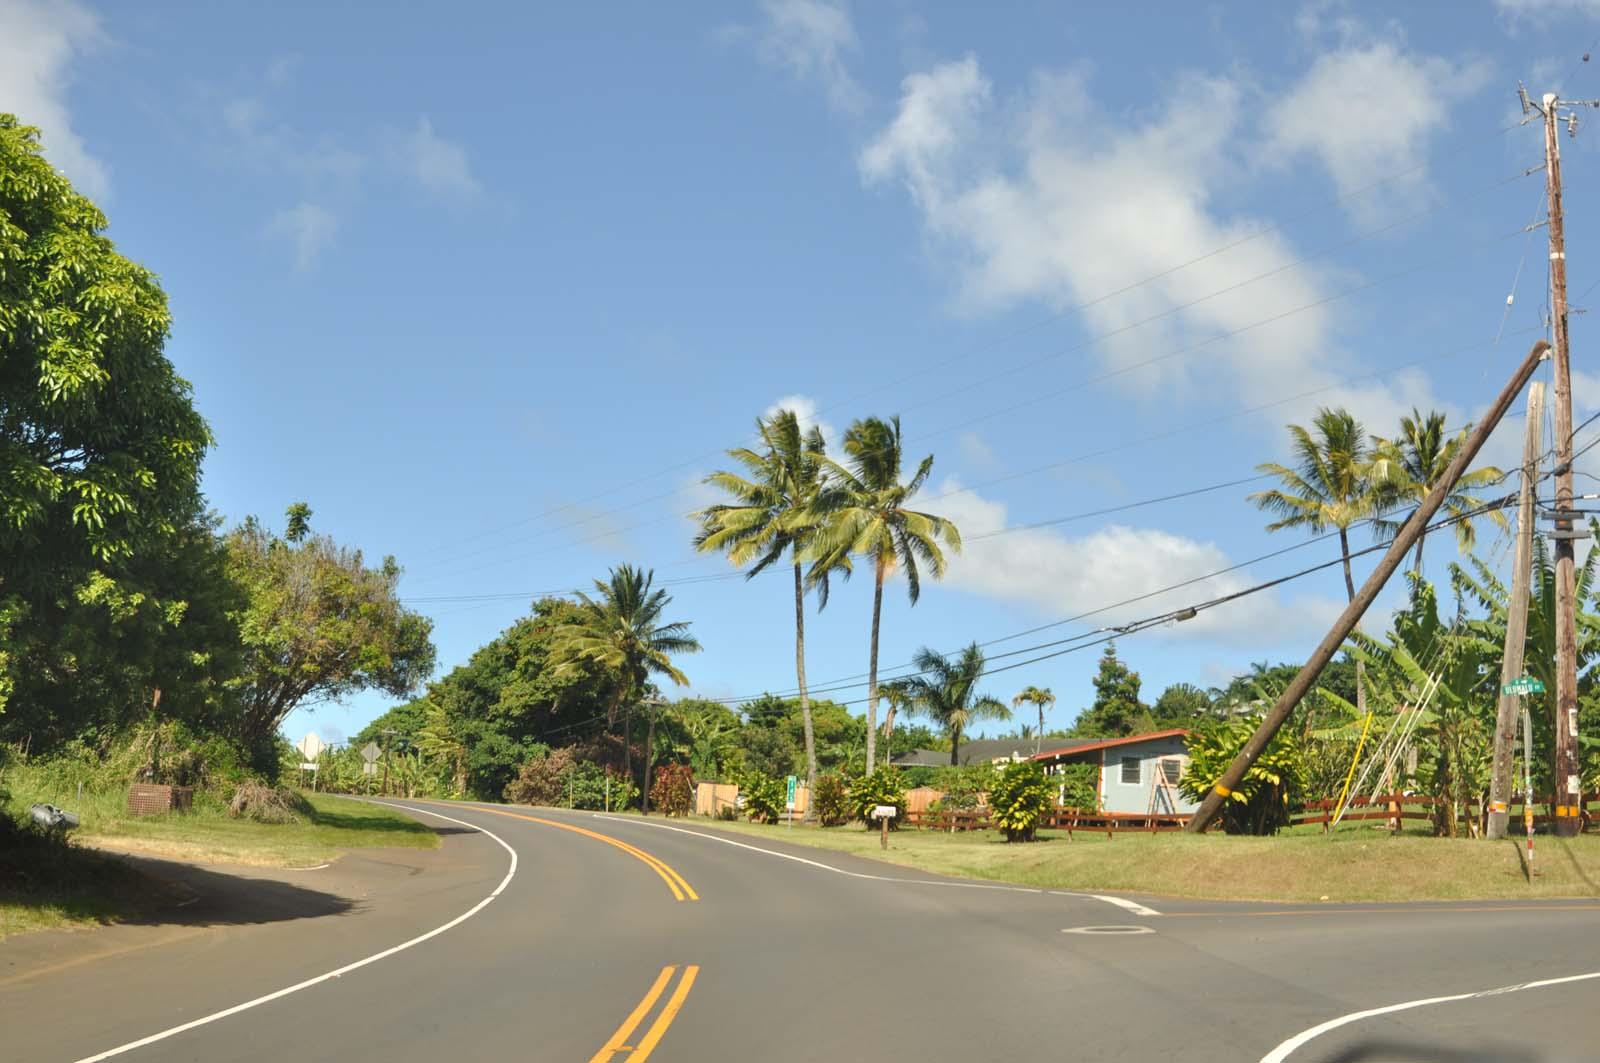 009_maui_hawaii_island